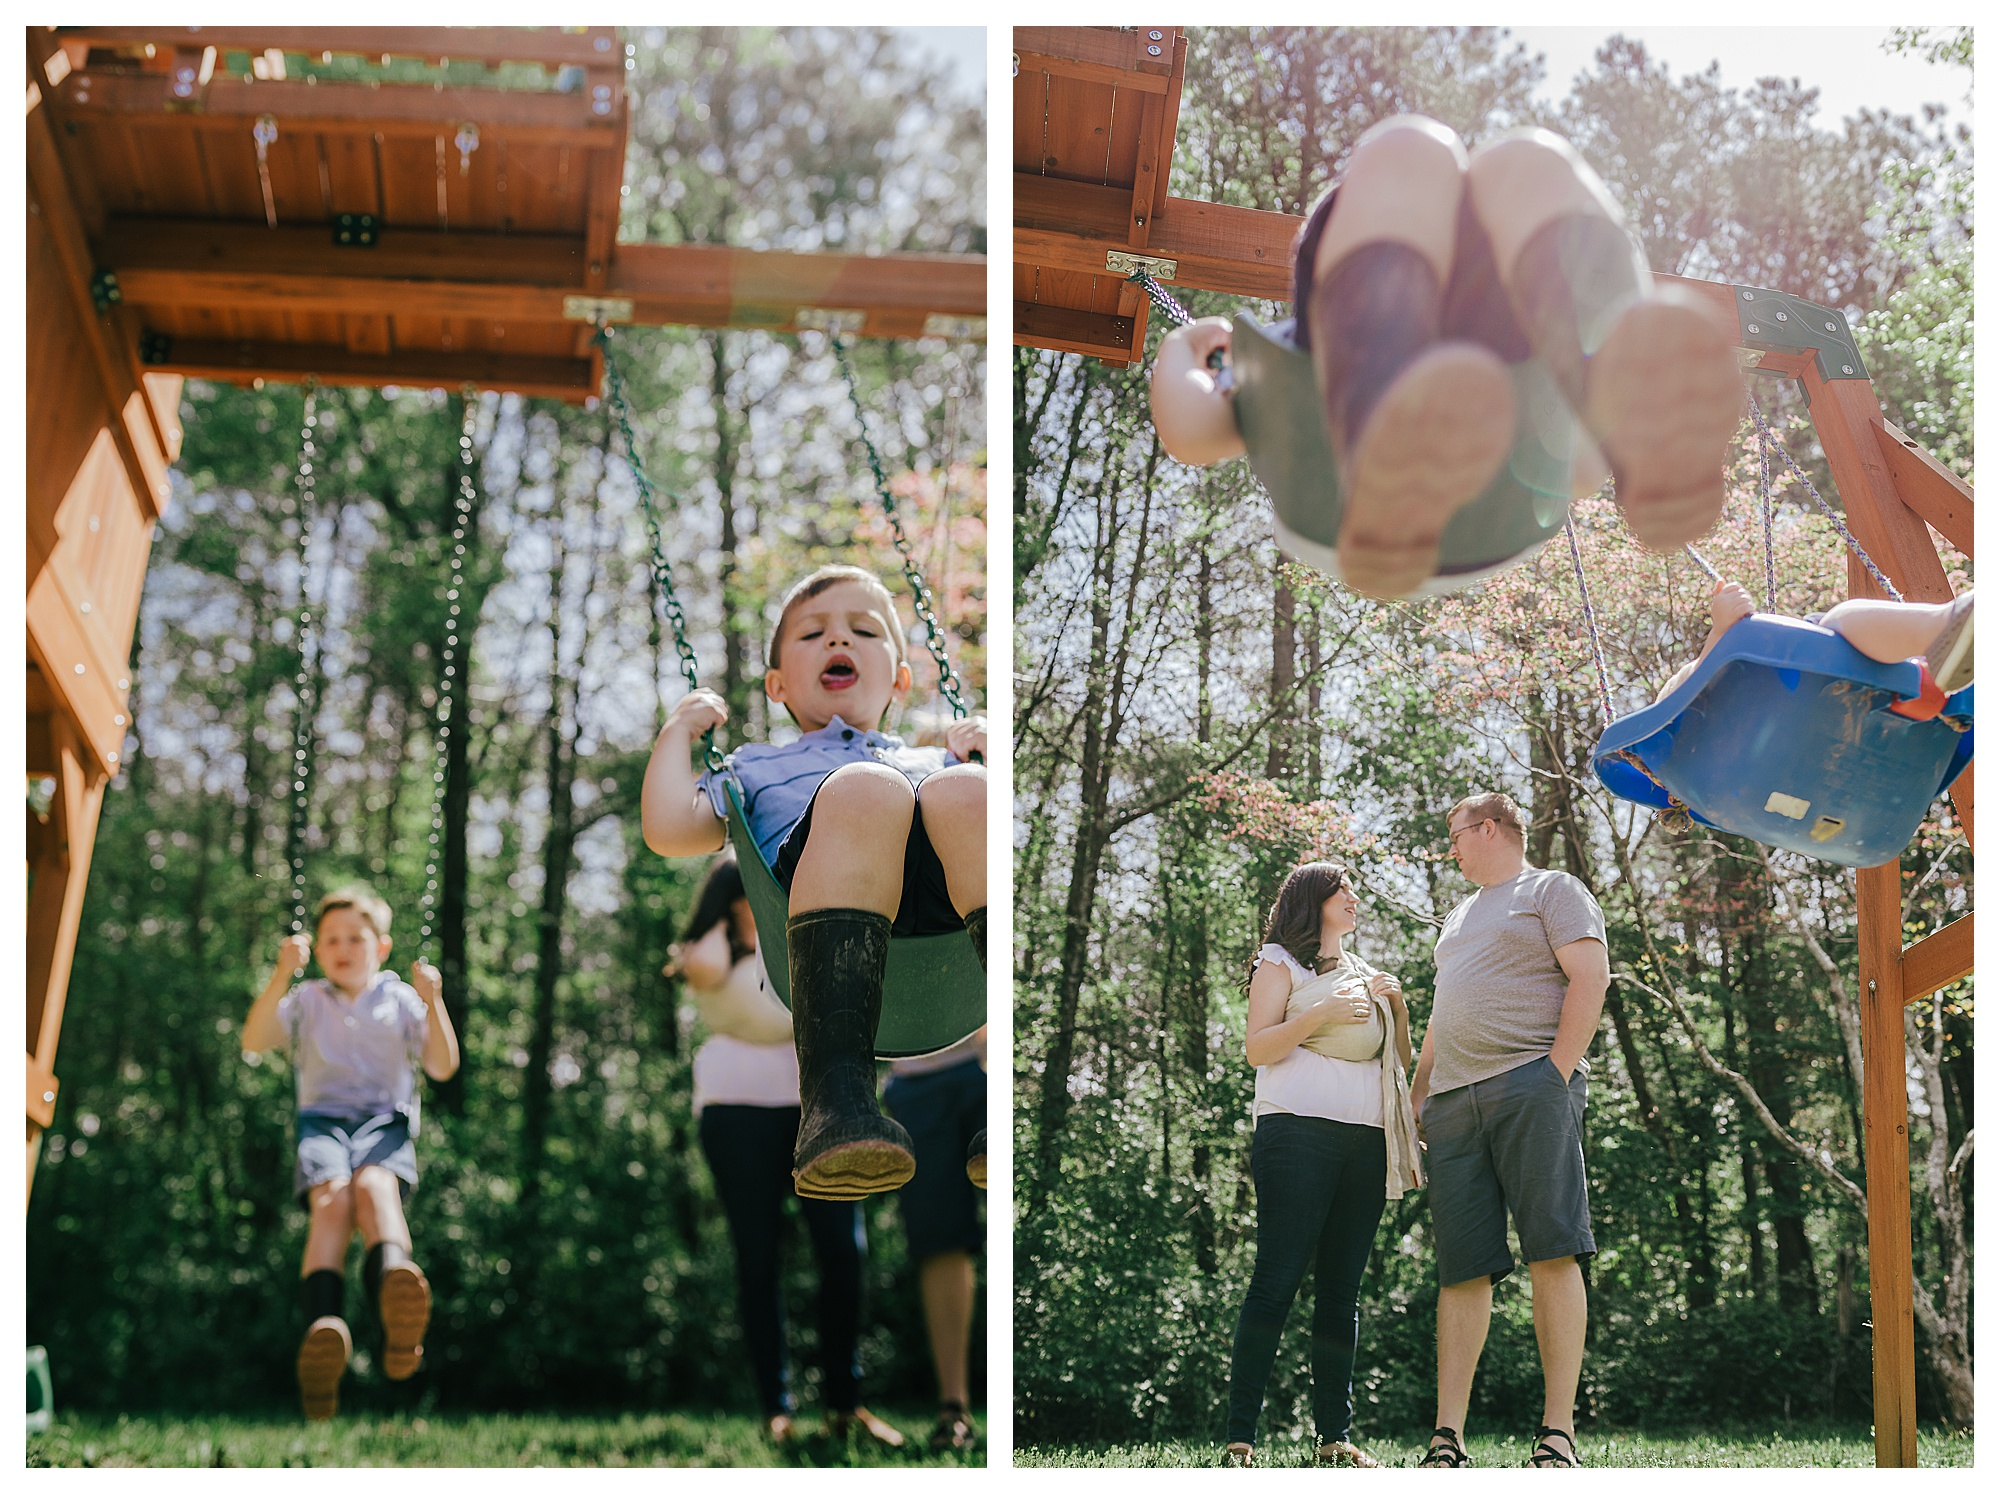 Emily Lapish Photo + Film | Family films and photographs